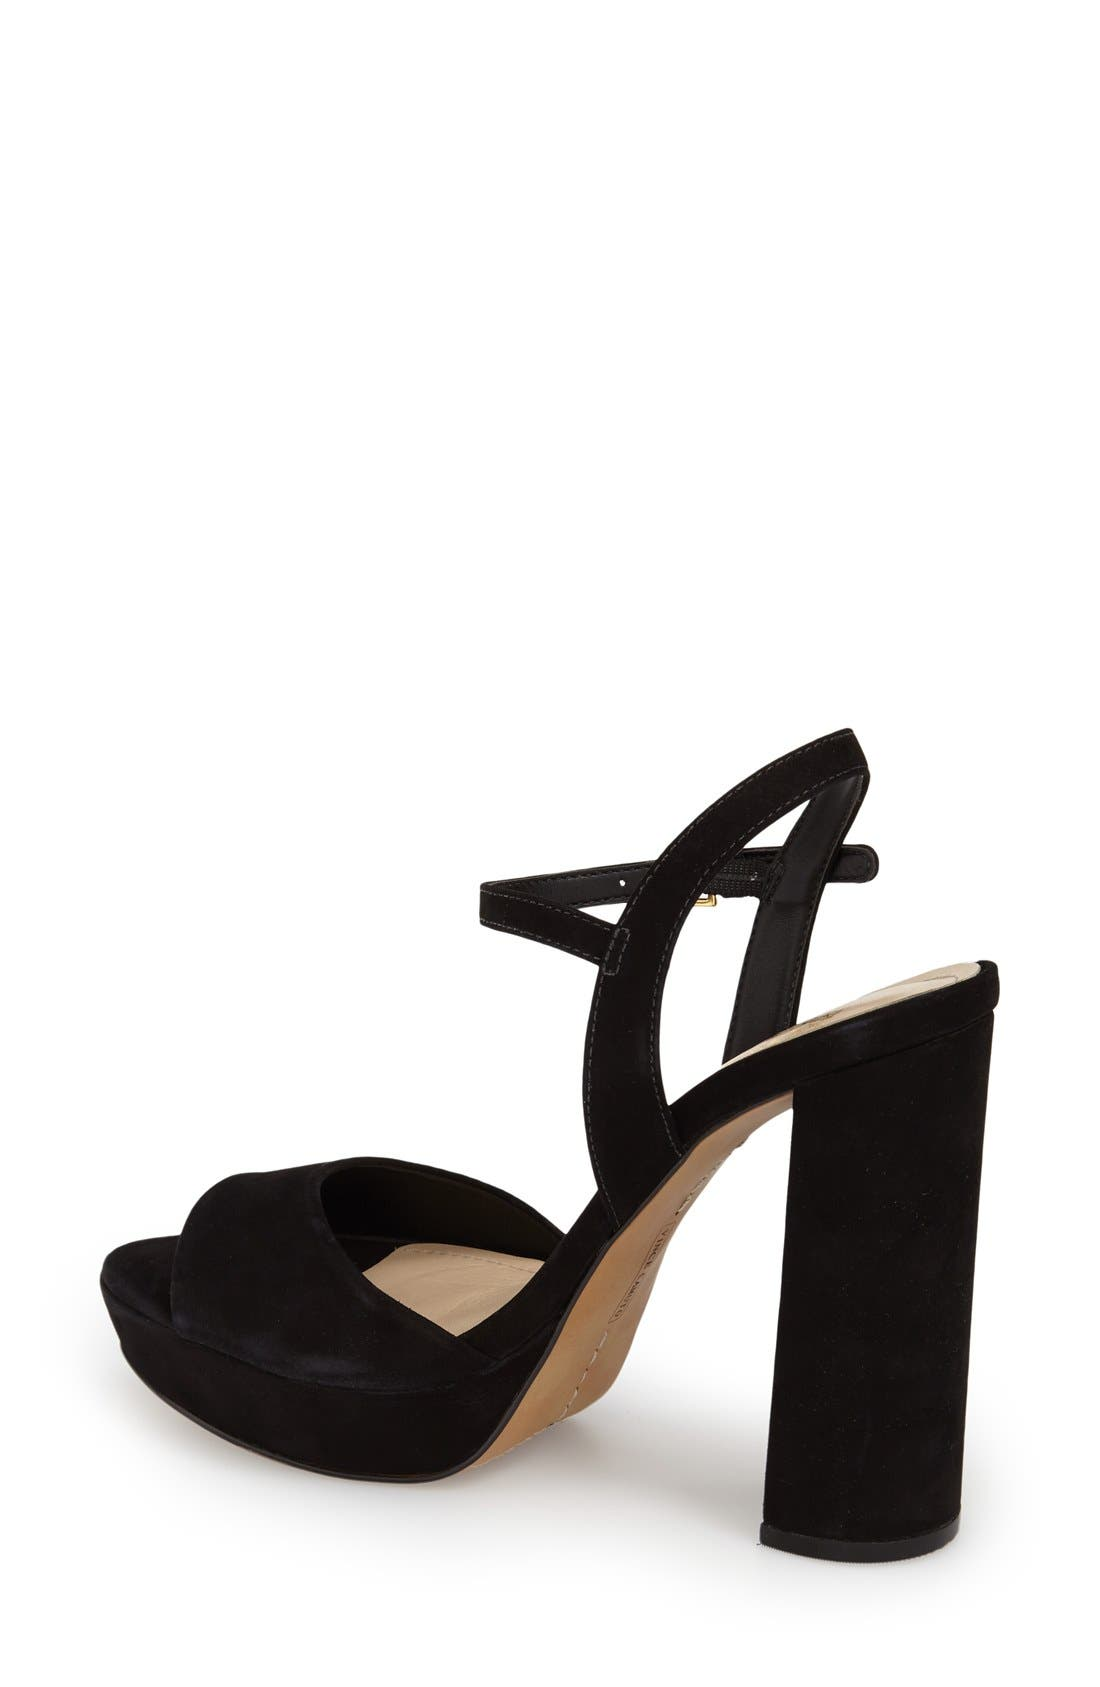 'Krysta' Platform Sandal,                             Alternate thumbnail 3, color,                             001